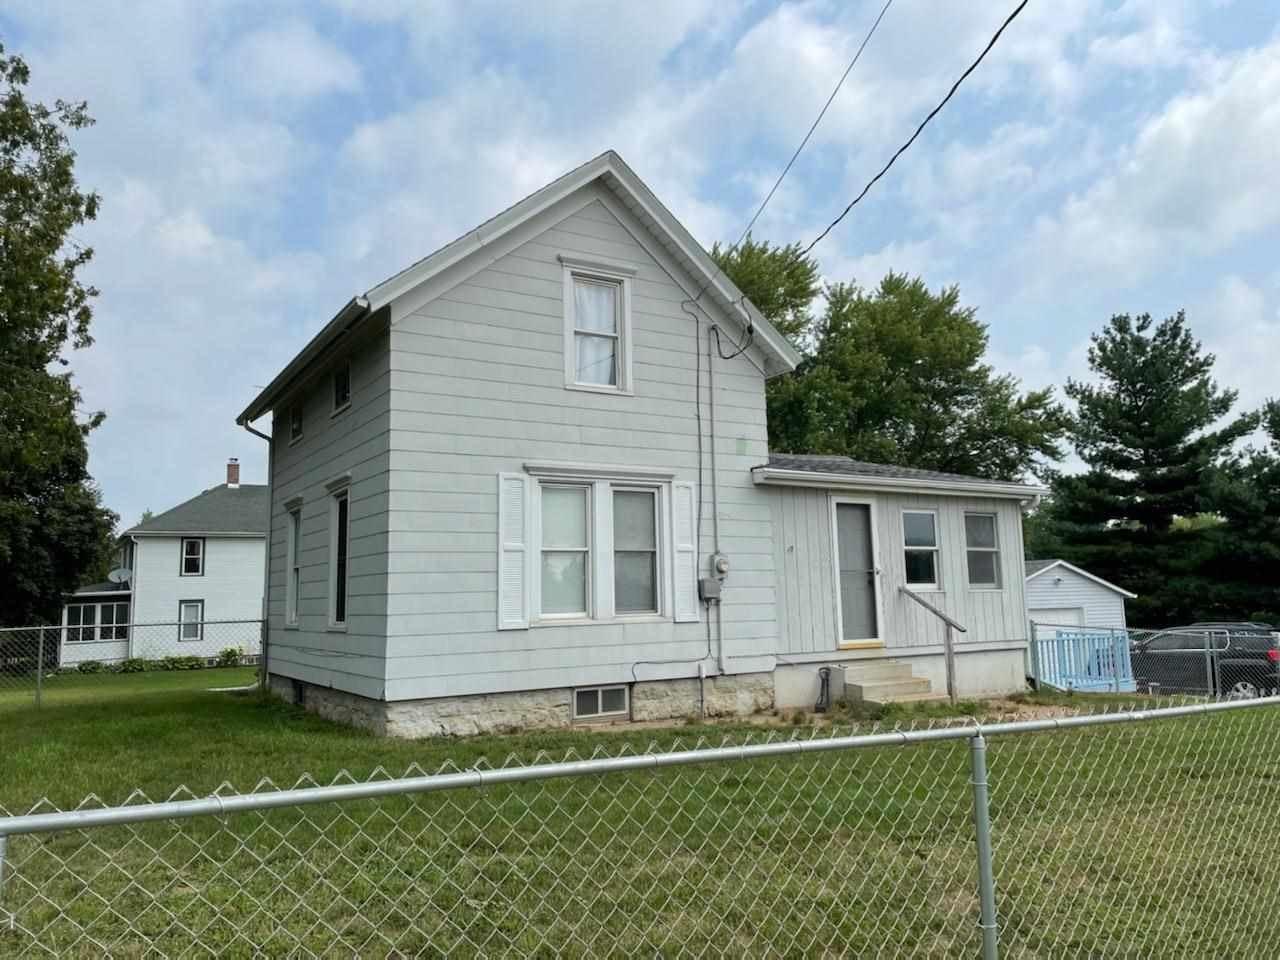 f_1914315 Real Estate in 53534 zip code